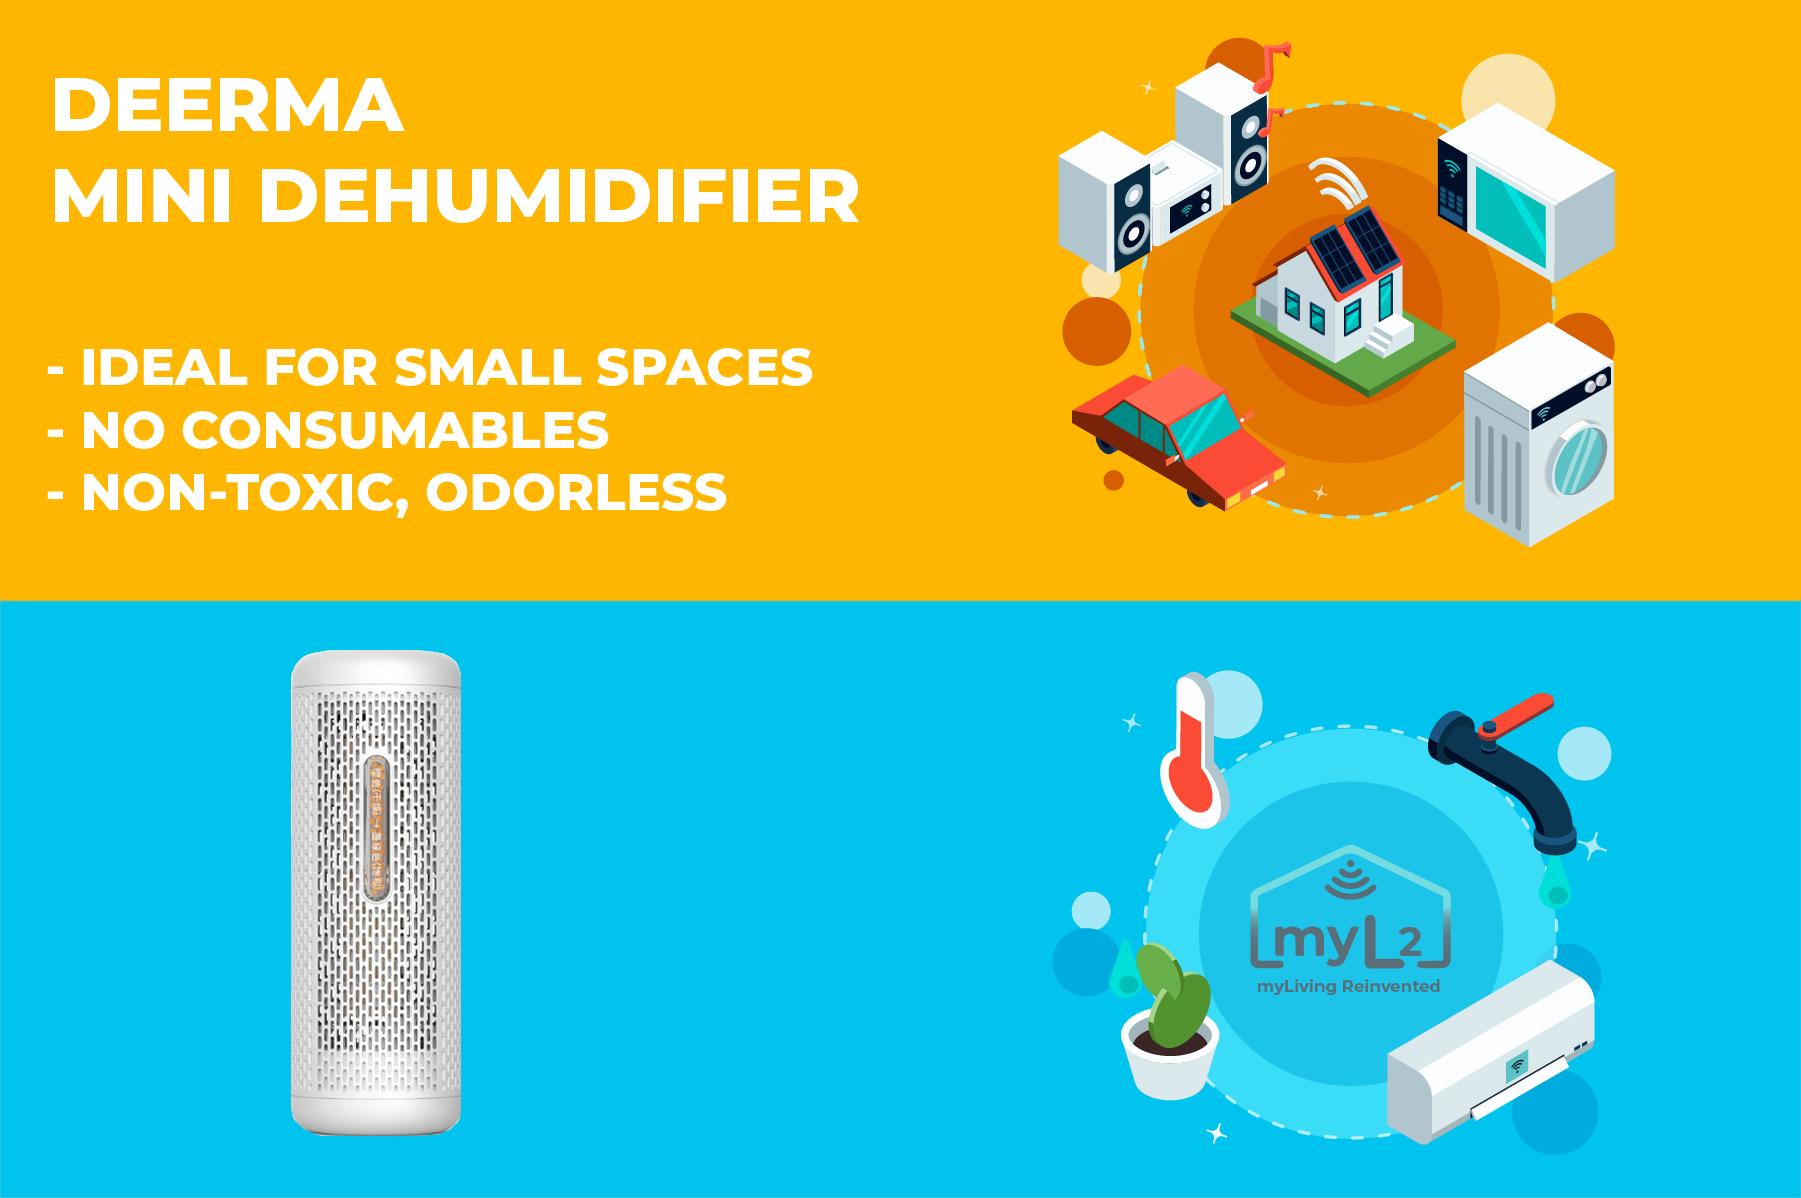 deerma mini dehumidifier xiaomi